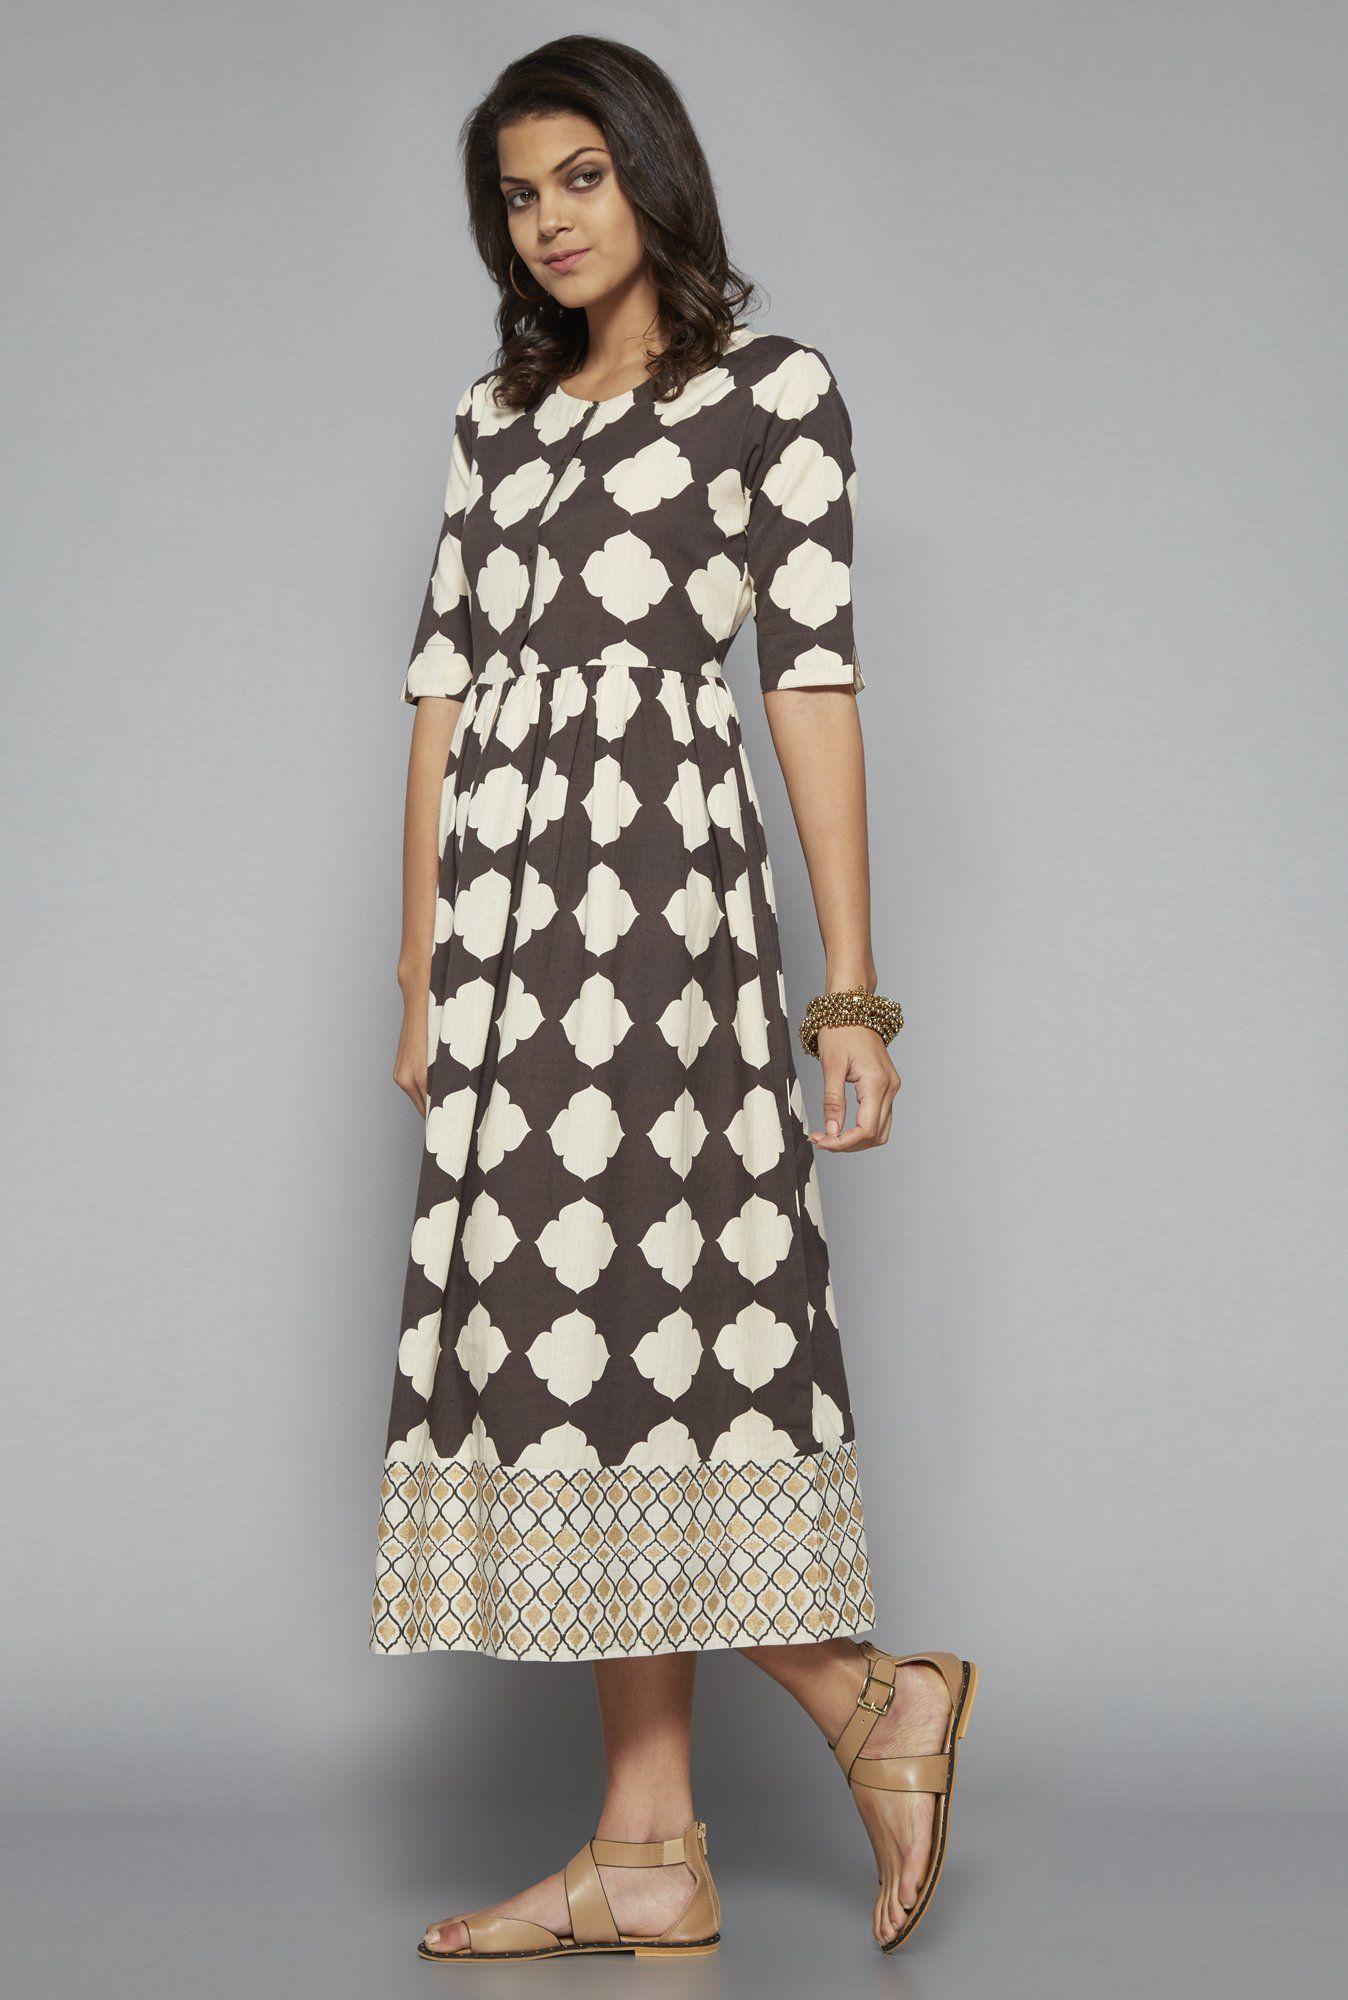 196f85881434a Bombay Paisley by Westside Grey Dress | utsa in 2019 | Dresses, Gray ...